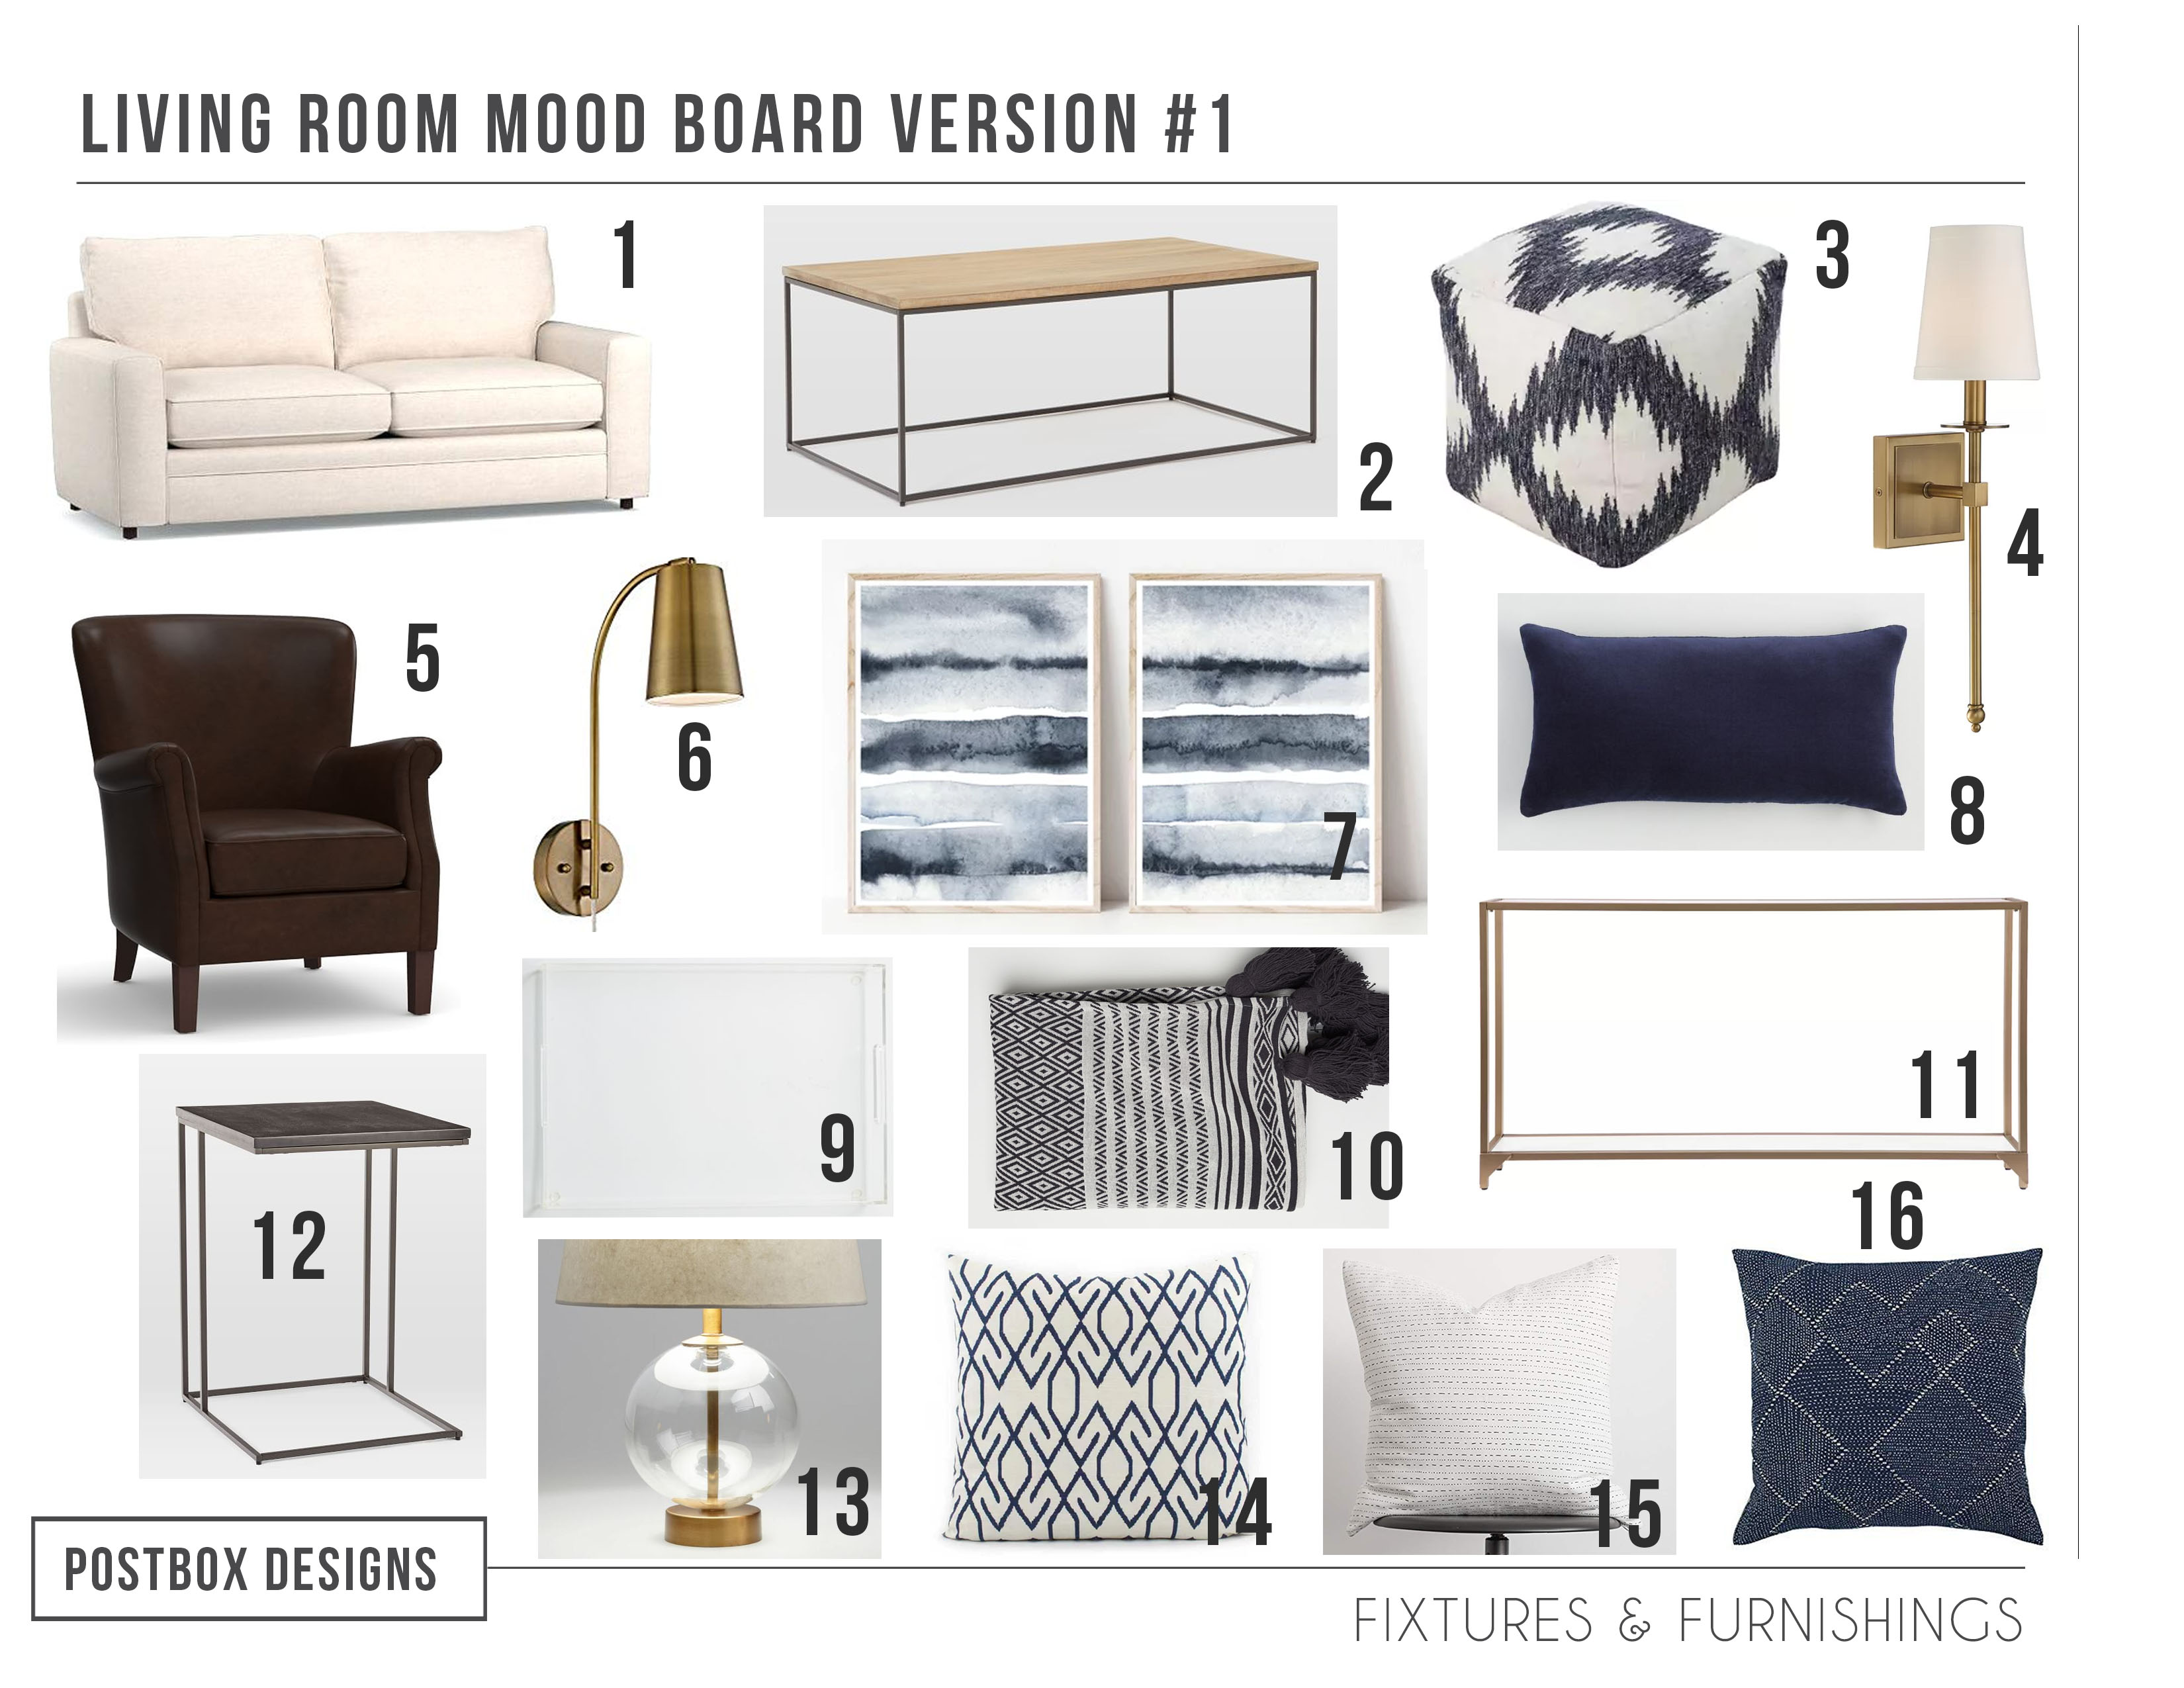 modern-meets-traditional-living-room-decor-online-interior-design